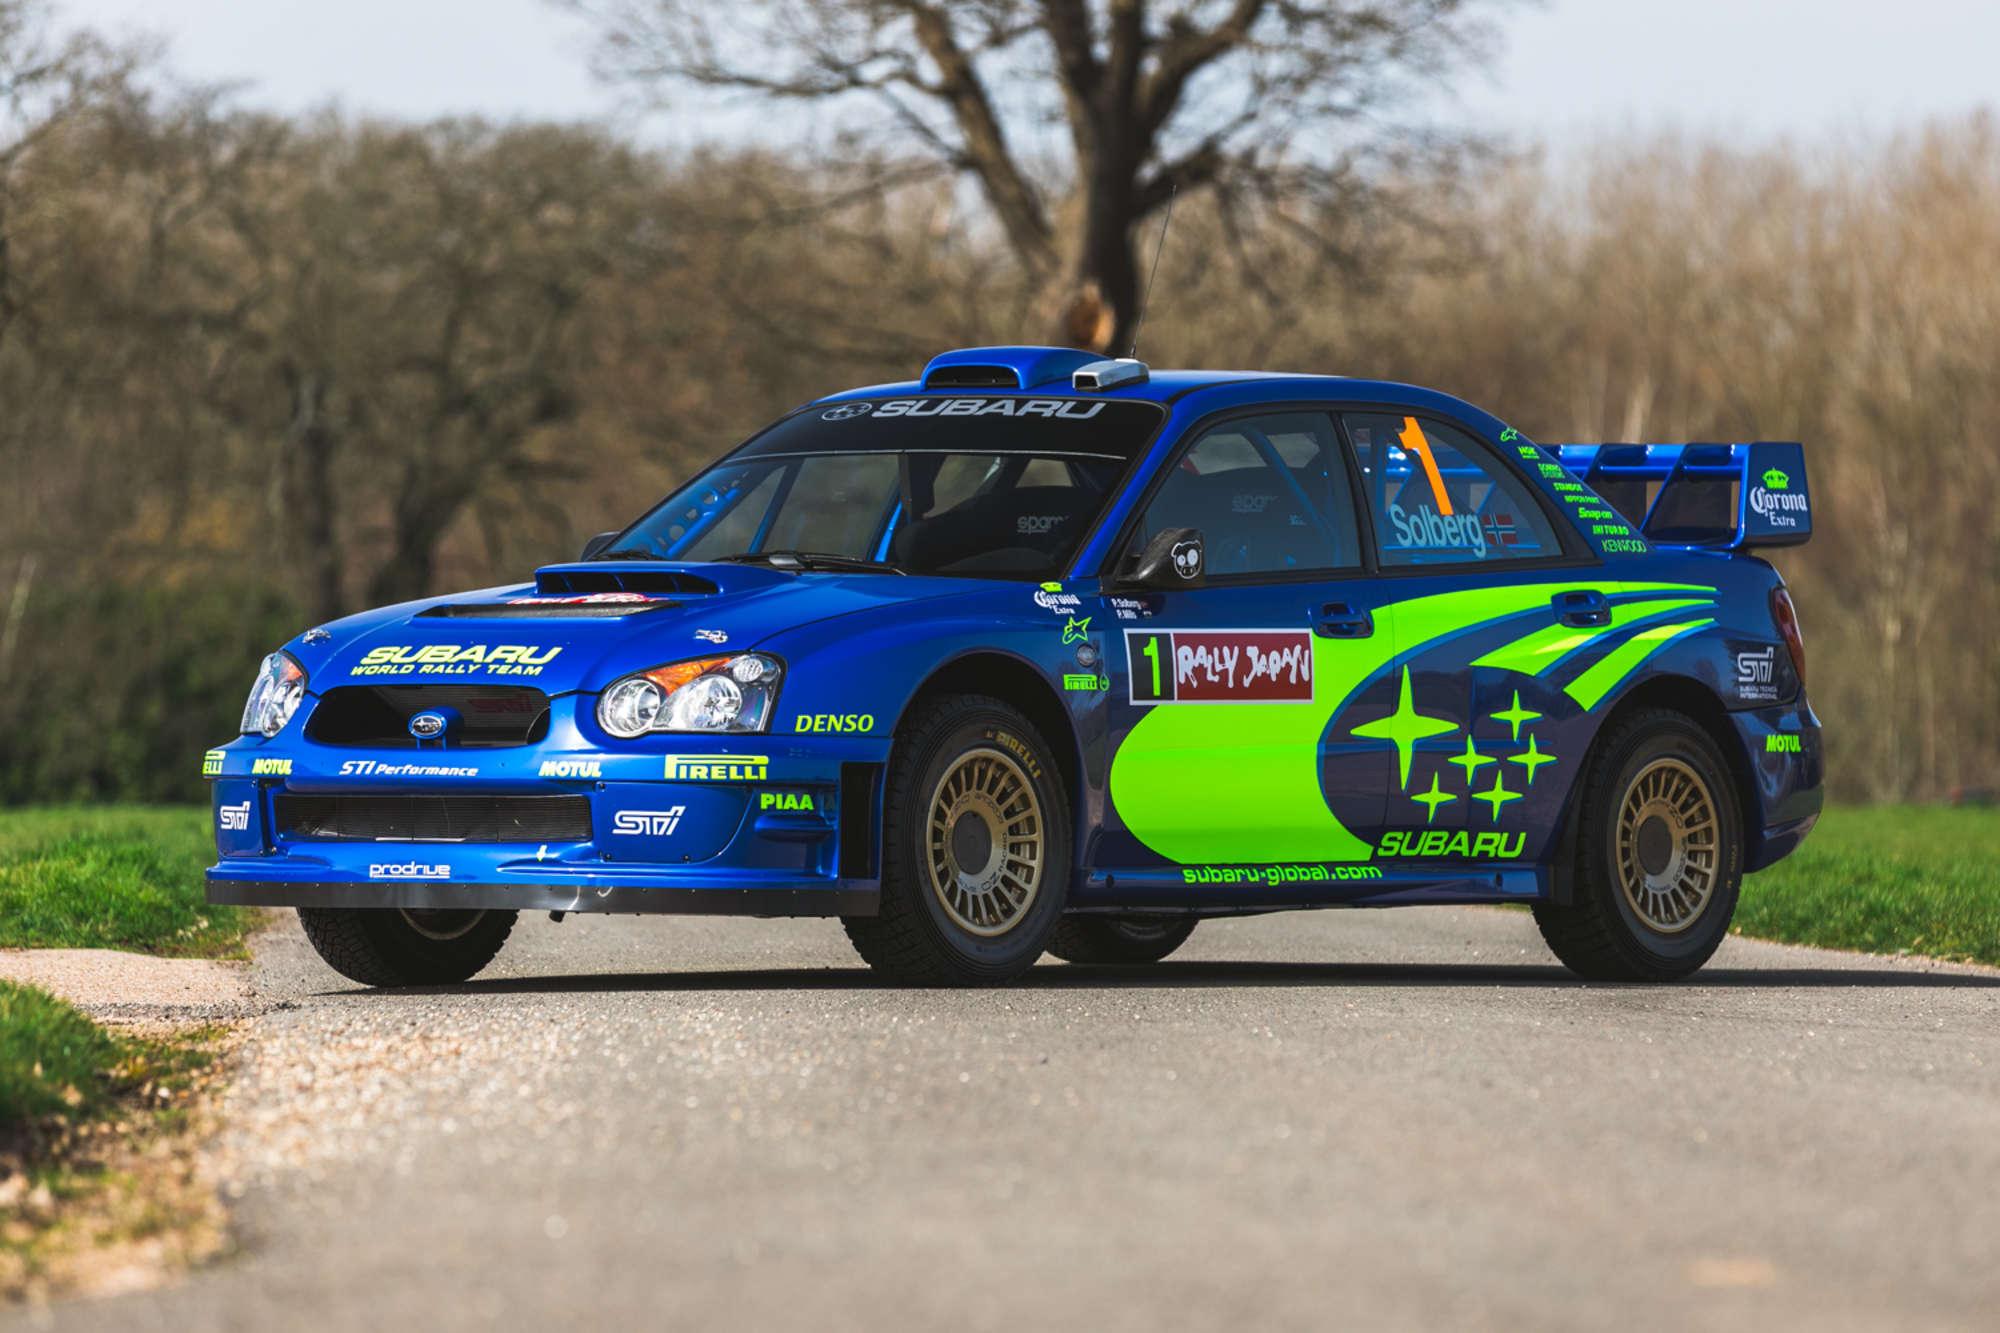 For Sale: Petter Solberg's 2004 Subaru S10 WRC rally car